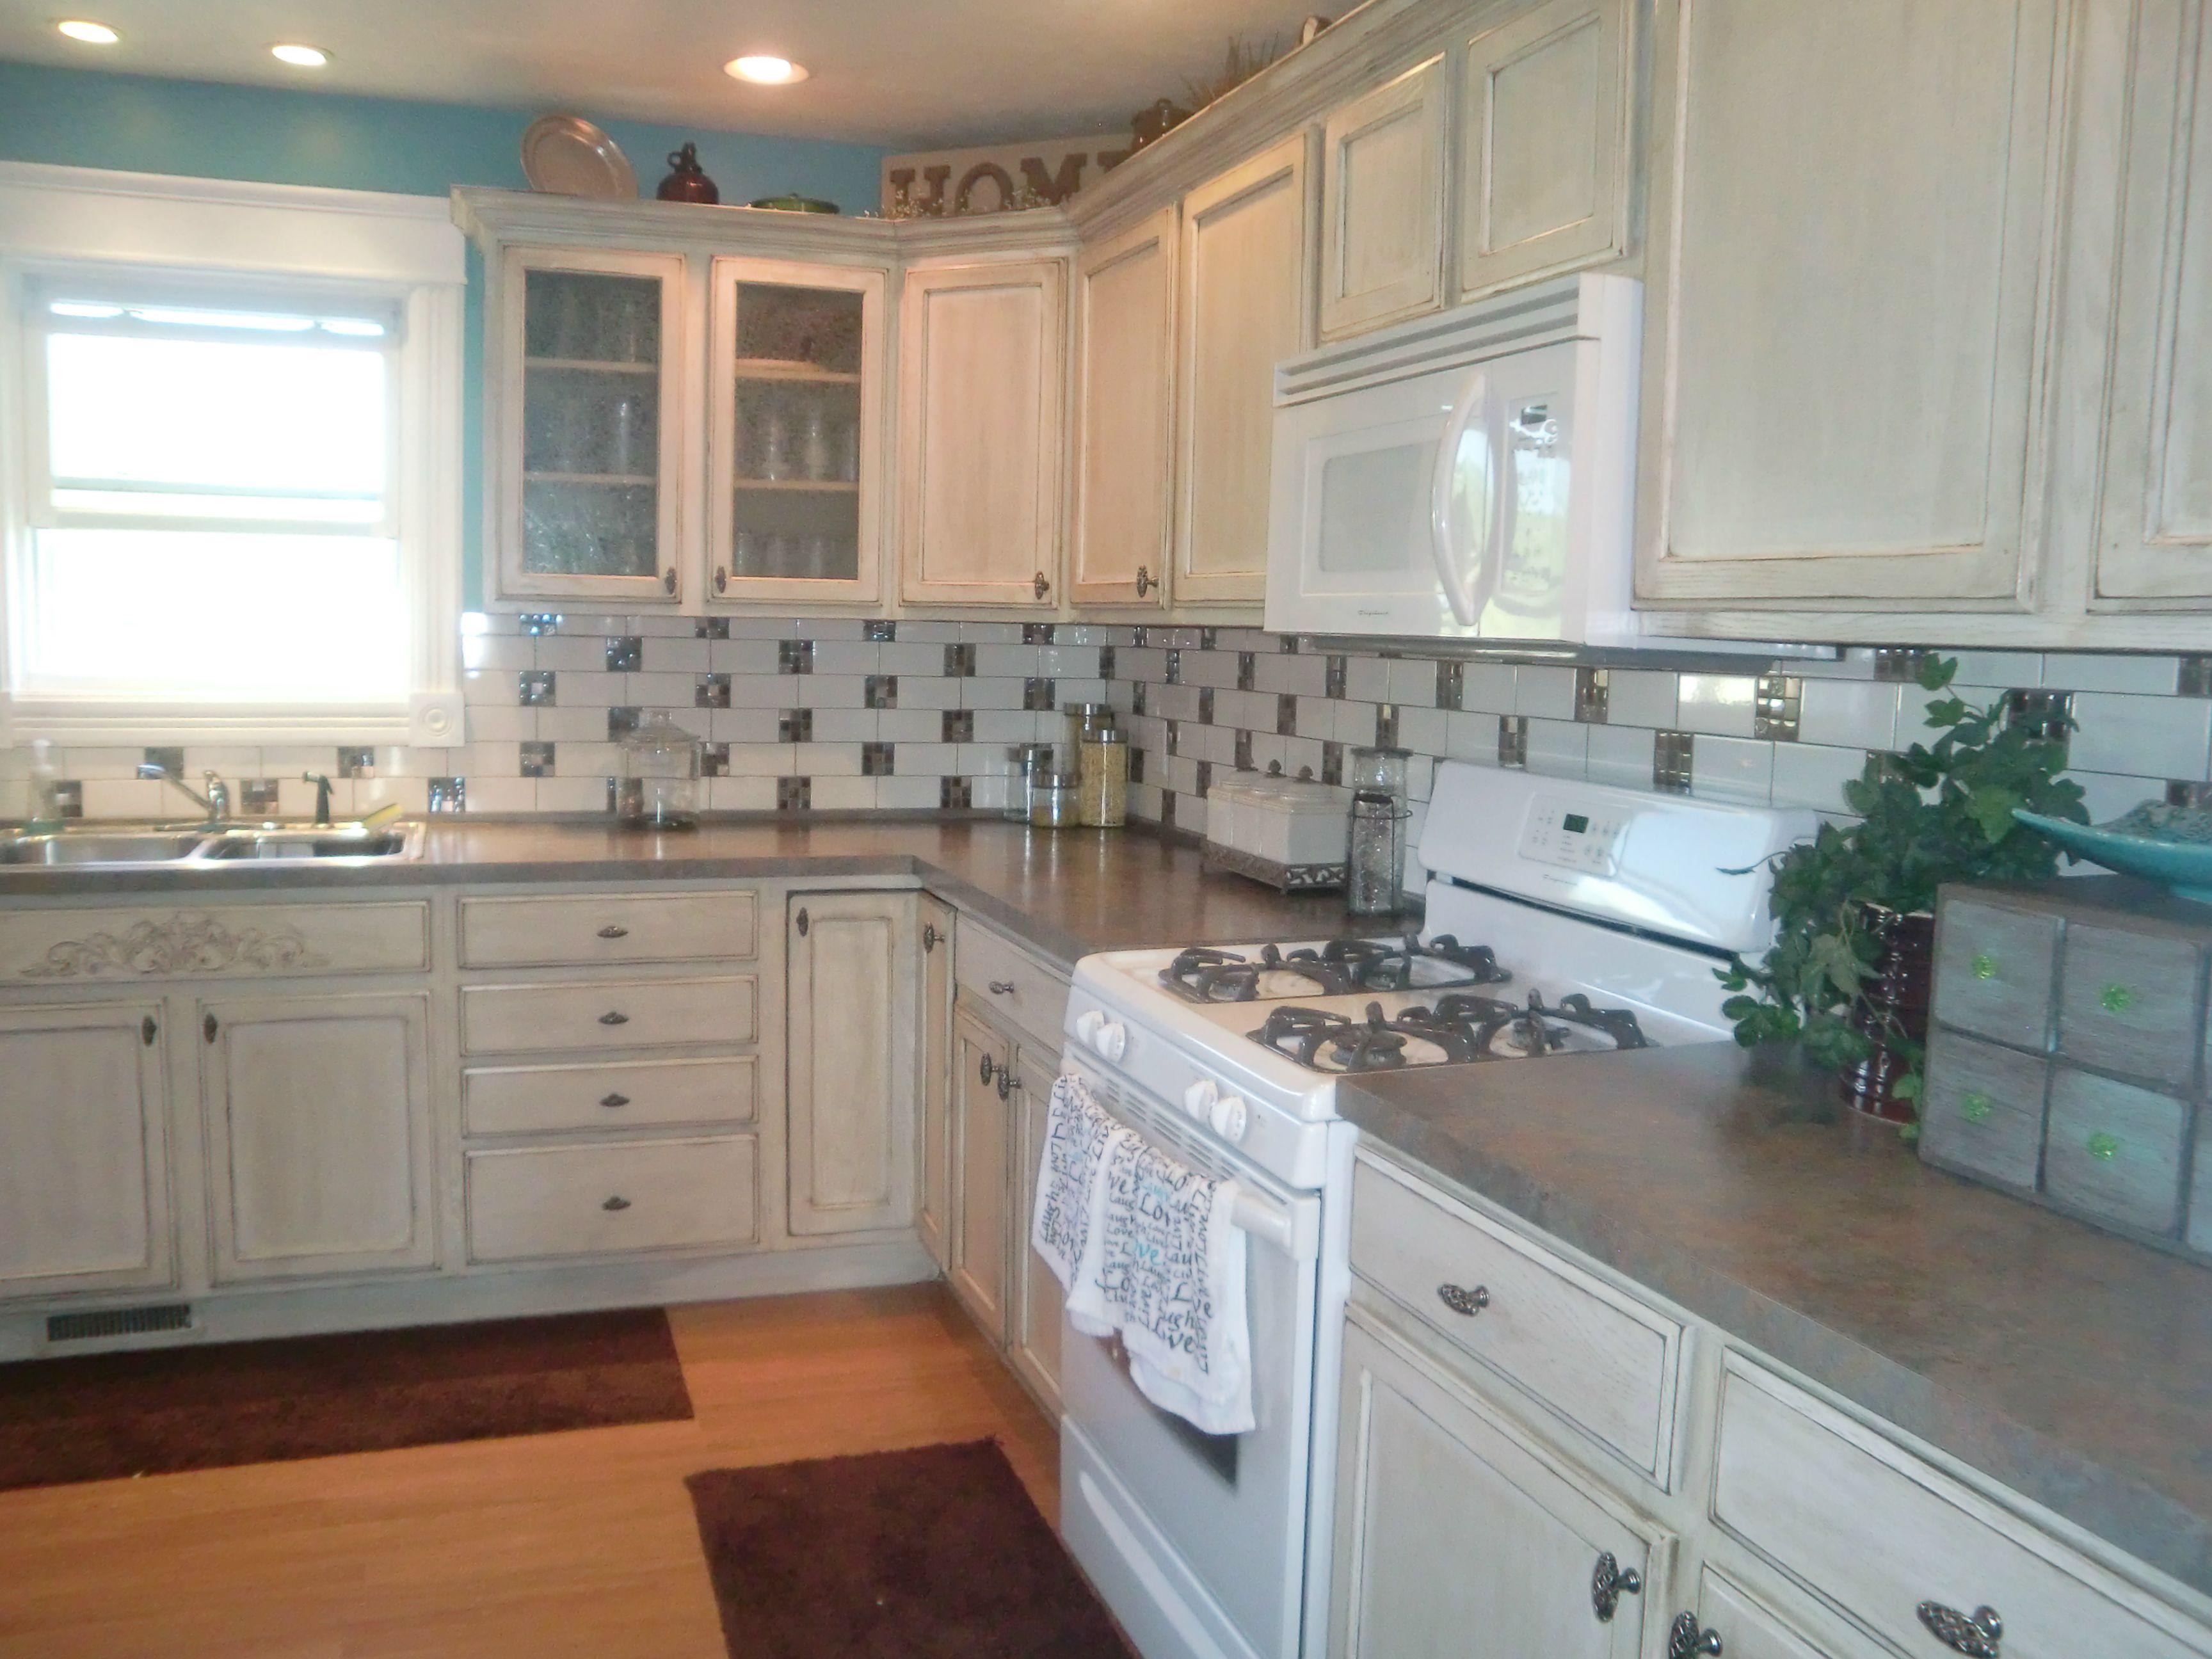 Distressed kitchen cabinets | Home design ideas | Pinterest